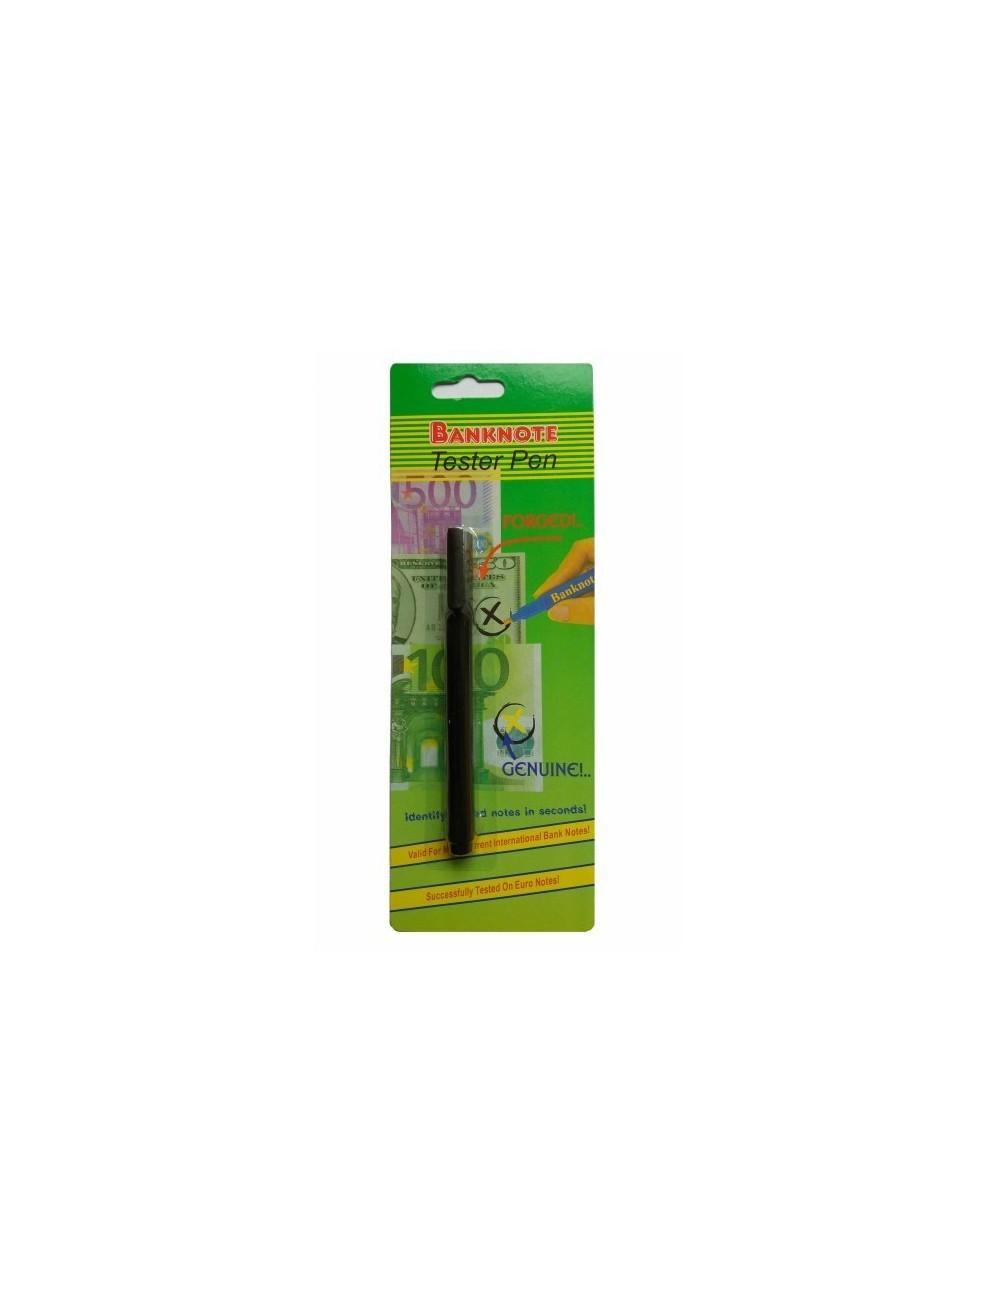 Blister Στυλό- μαρκαδόρος ανιχνευτής πλαστών χαρτονομισμάτων